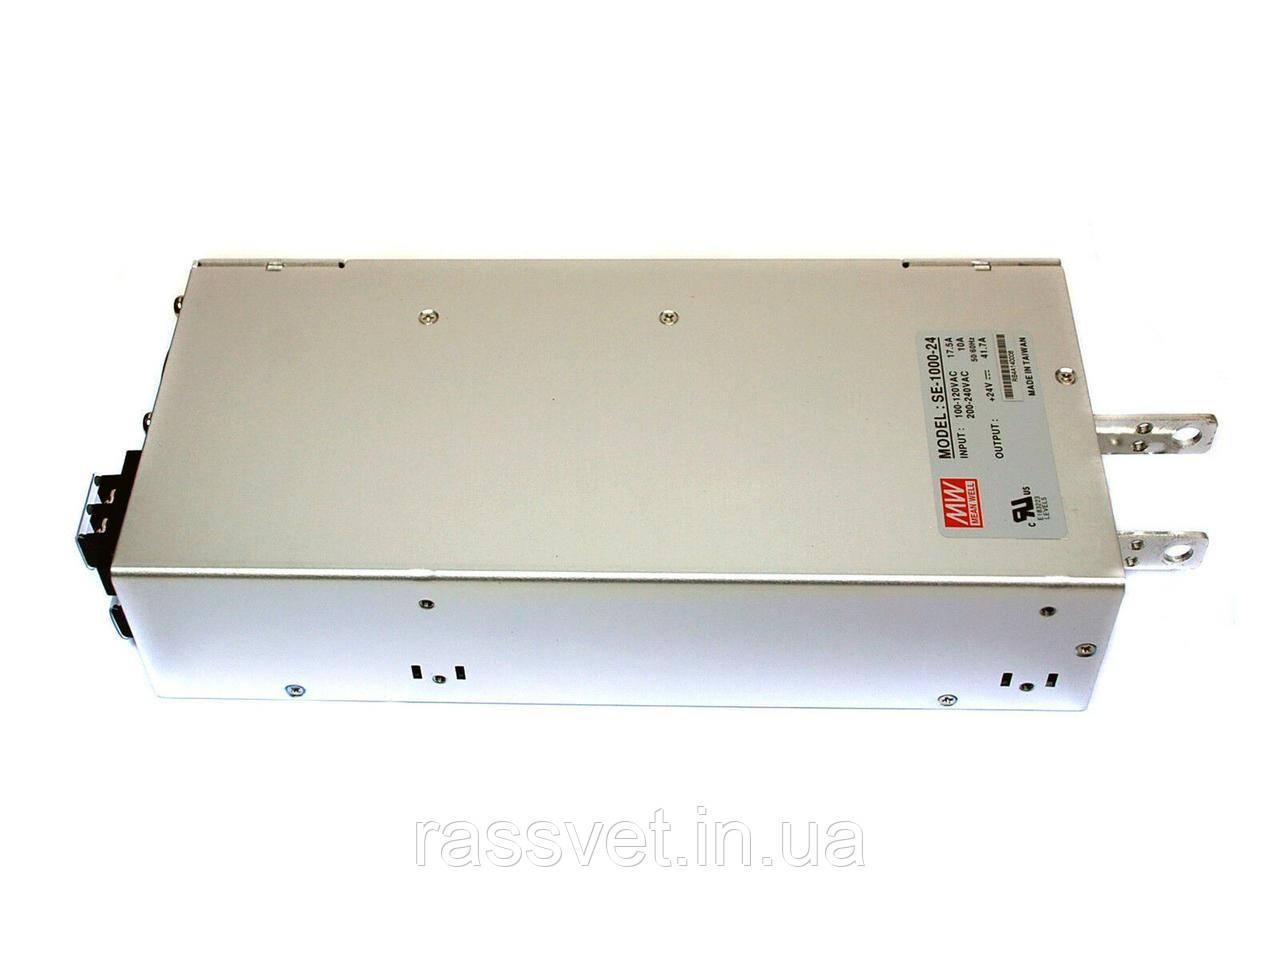 "Блок питания импульсный Mean Well 1000W 24V (IP20, 41.7A) Series ""SE"""